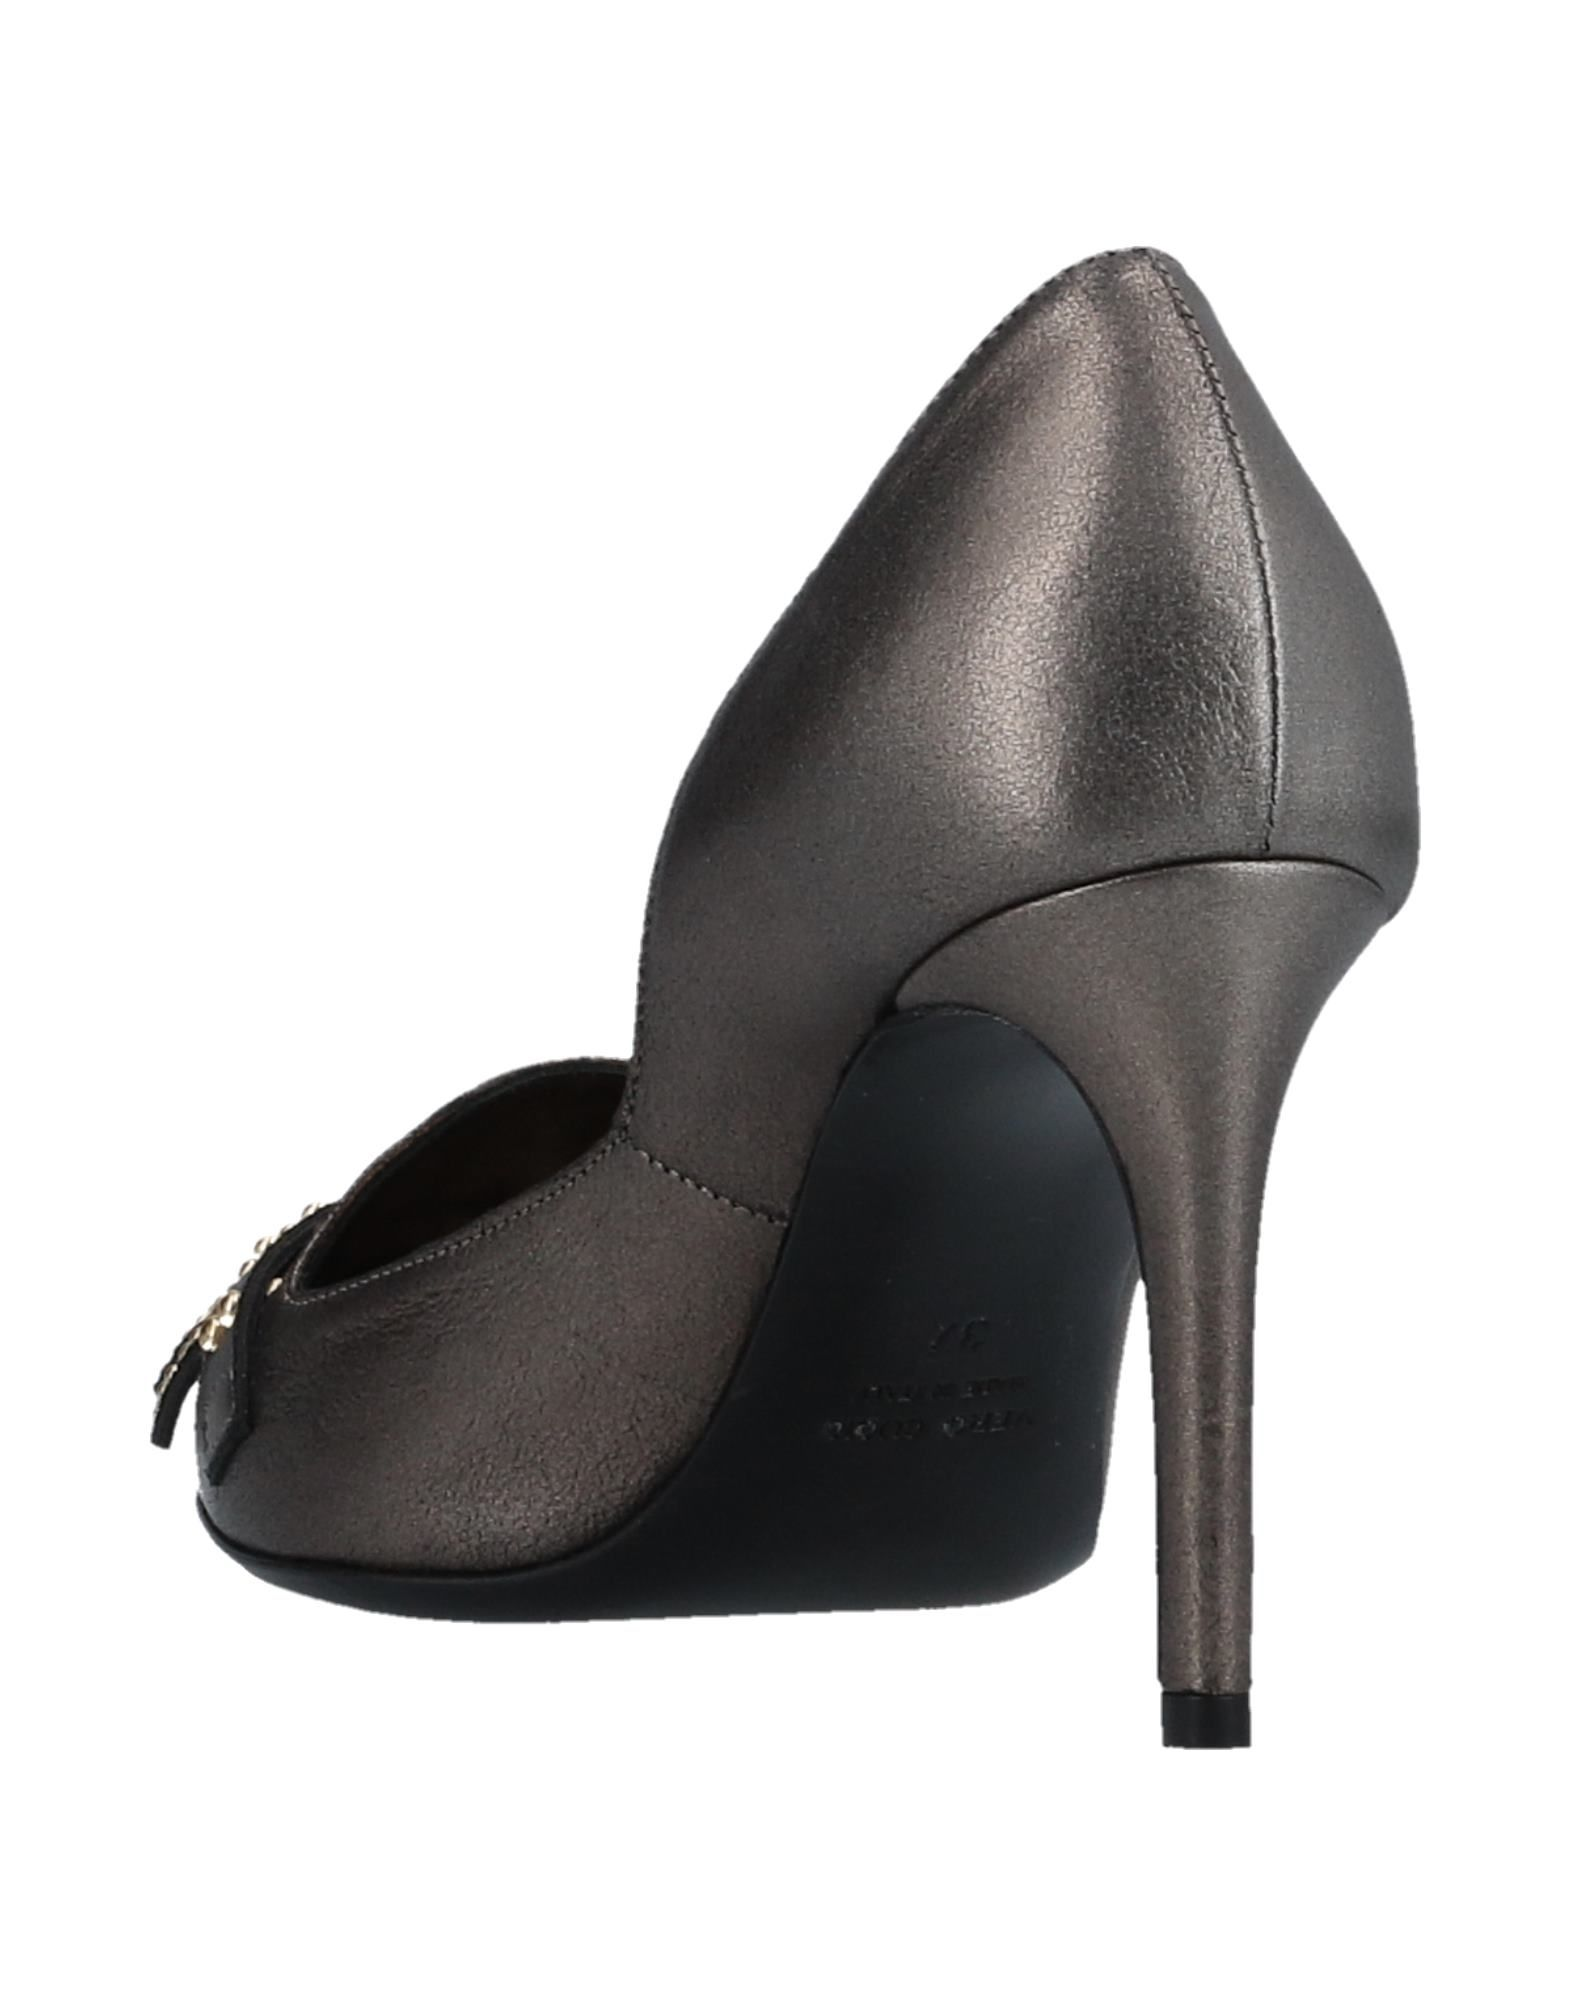 Stilvolle billige Schuhe Giancarlo Giancarlo Giancarlo Paoli Pumps Damen  11508510UV 0aa5e7